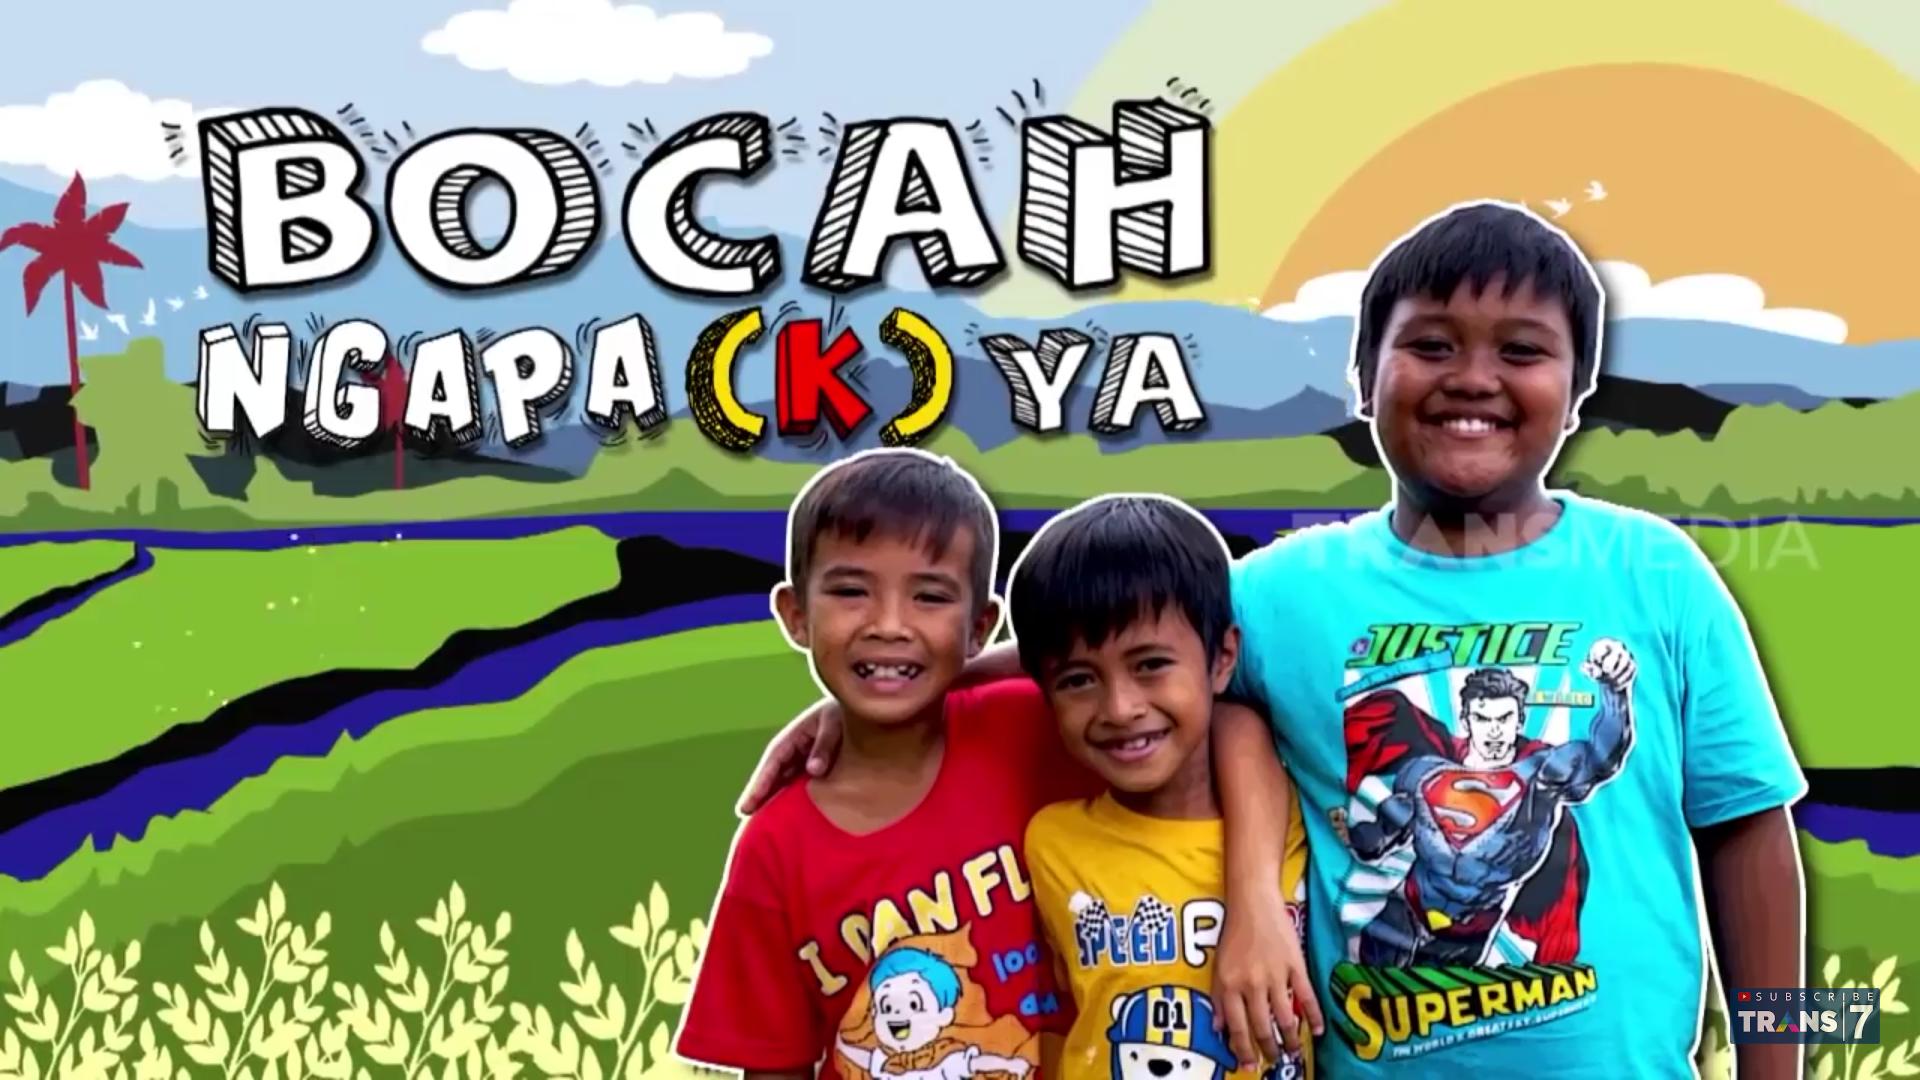 Bocah Ngapa(k) Ya